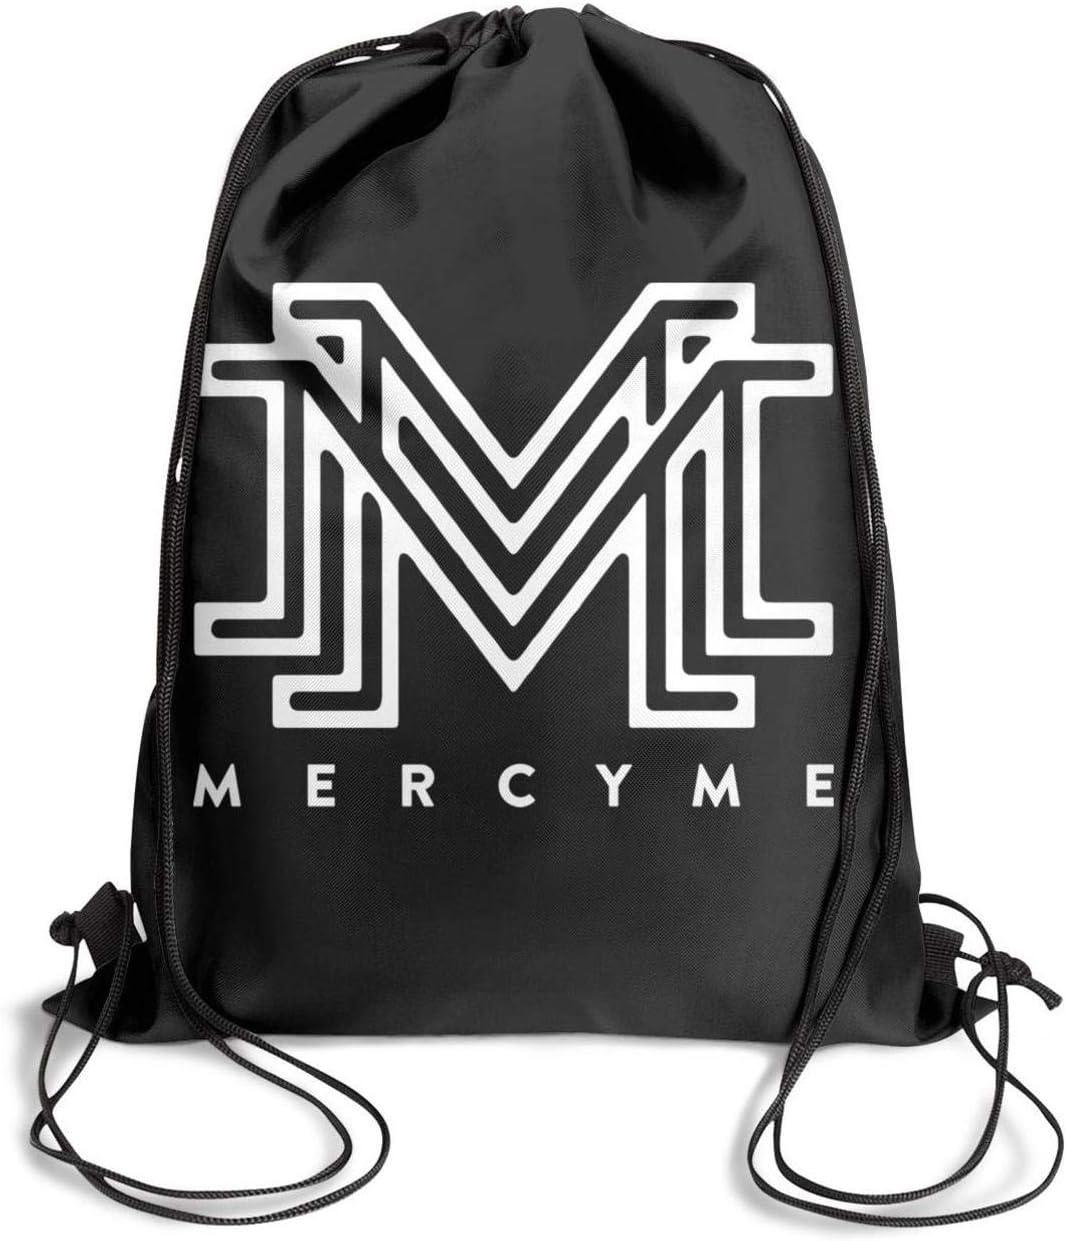 Drawstring Backpack Dancing Bag gym Sackpack Band Logo Printing cute Adjustable Gymsack for Men Women